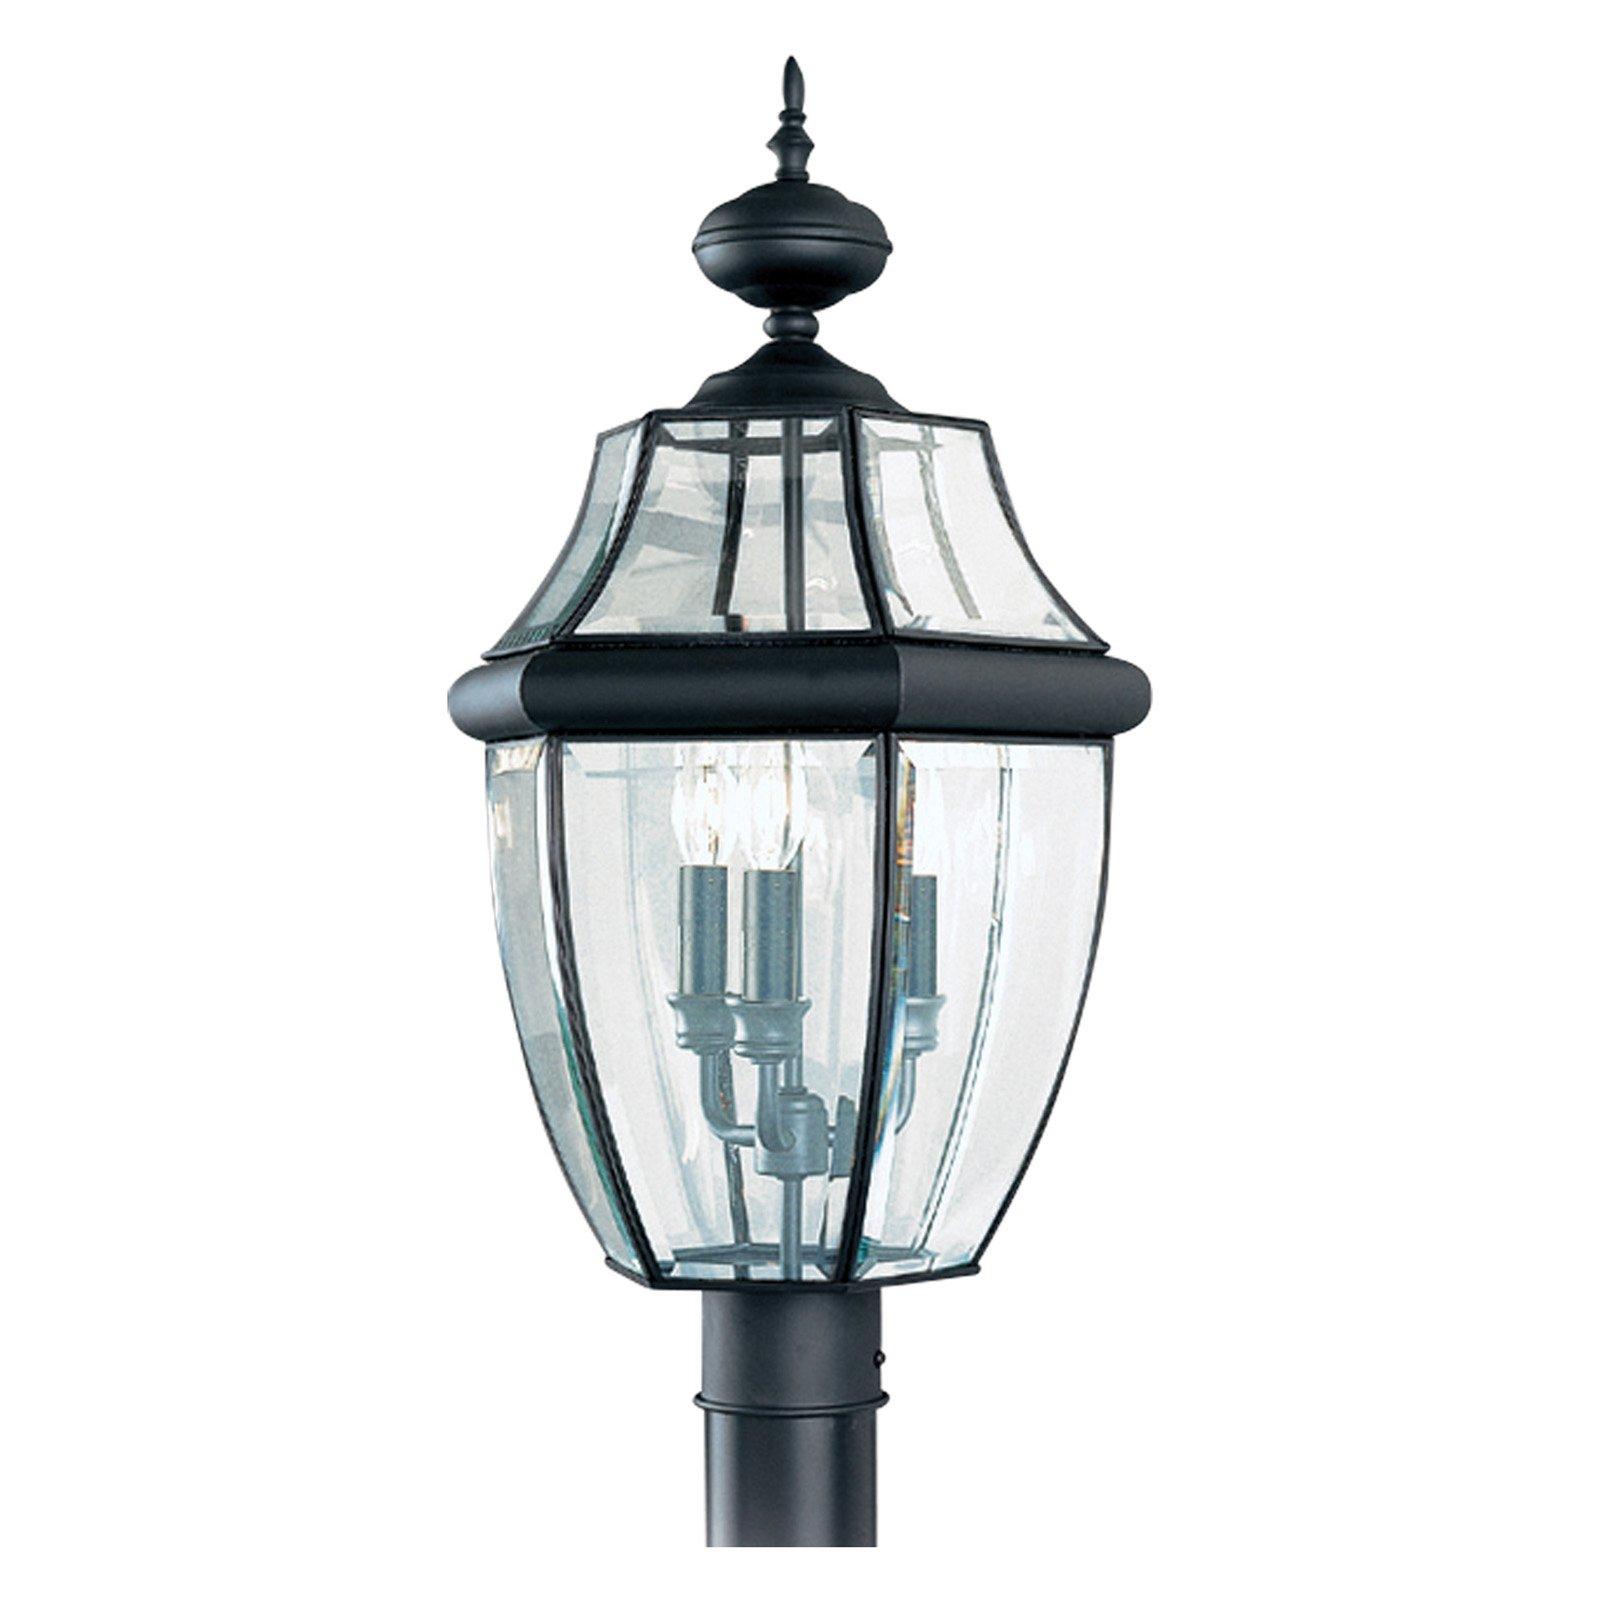 Sea Gull Lighting Lancaster 8239EN Outdoor Post Lantern